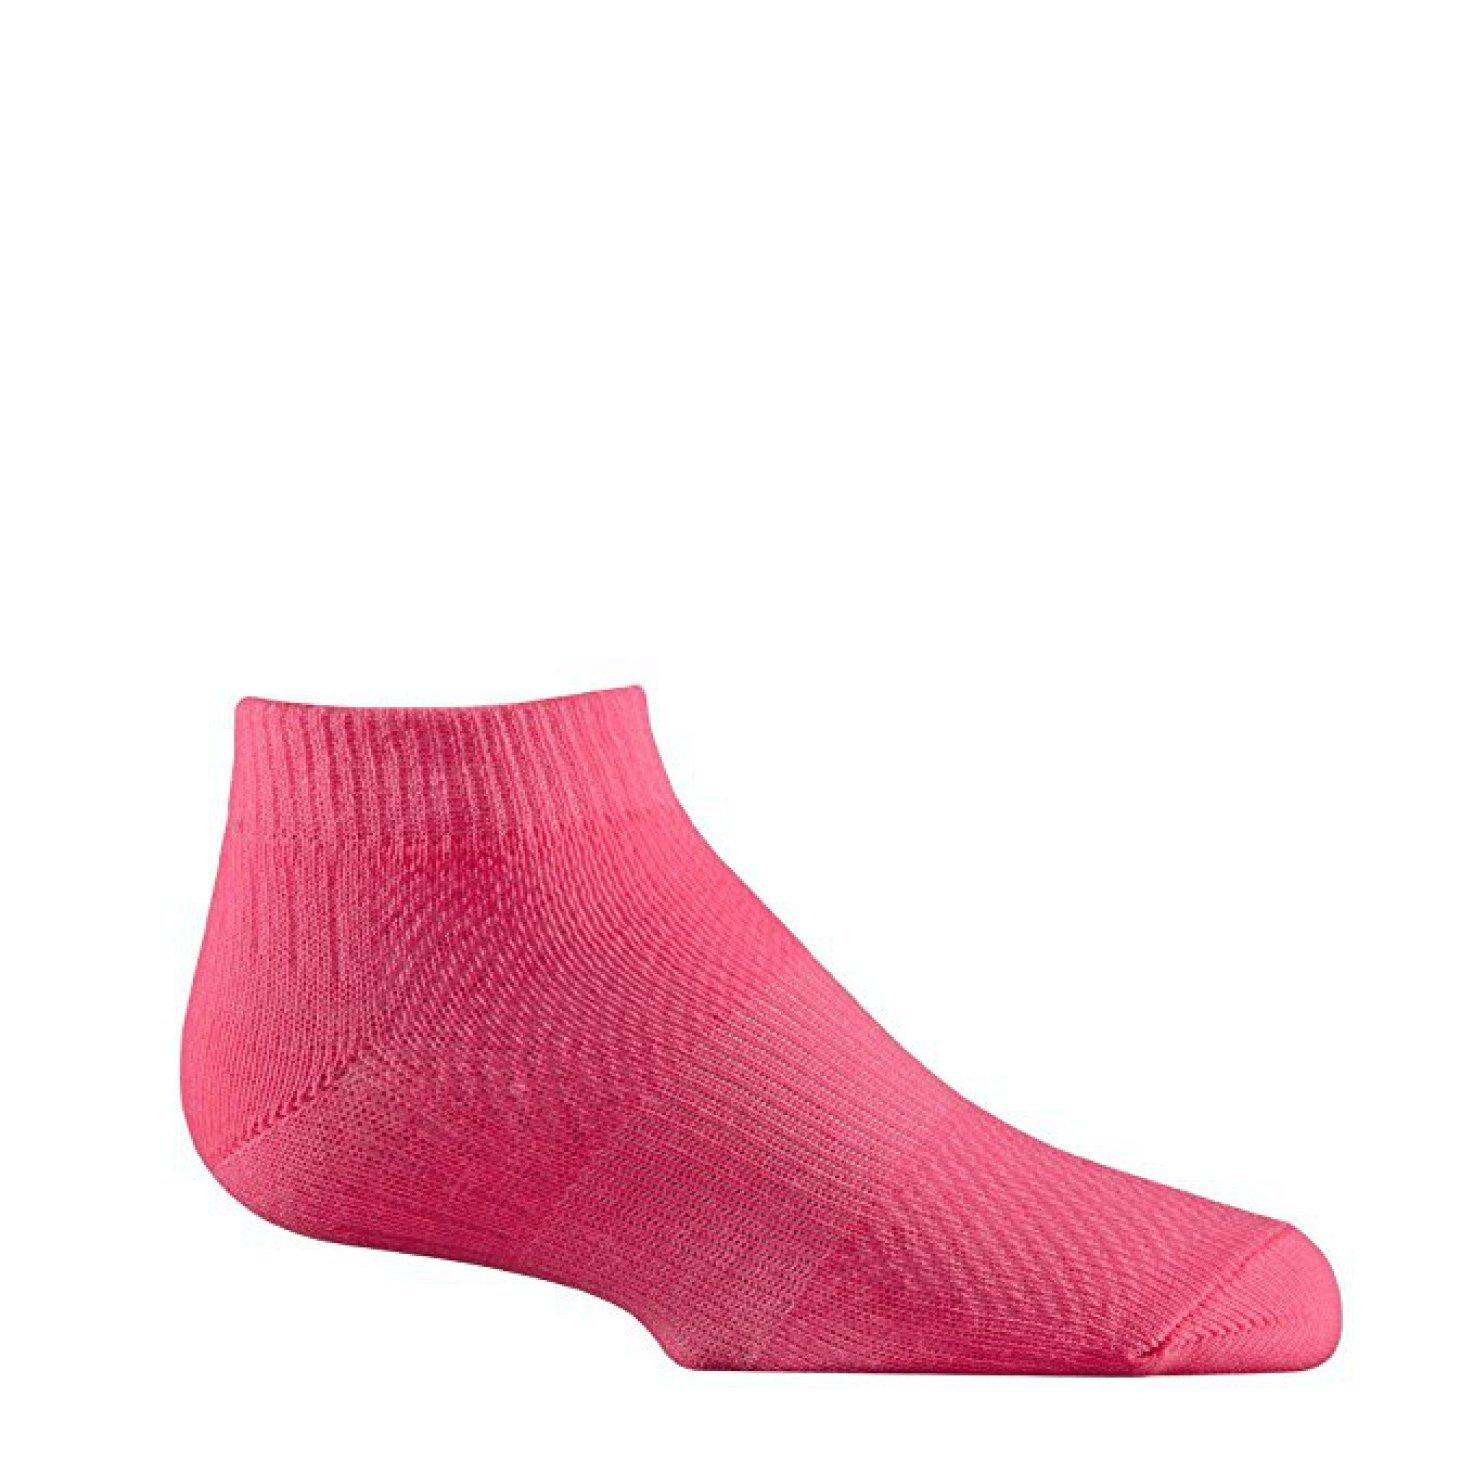 Wrightsock Coolmesh II Kids Low Sock